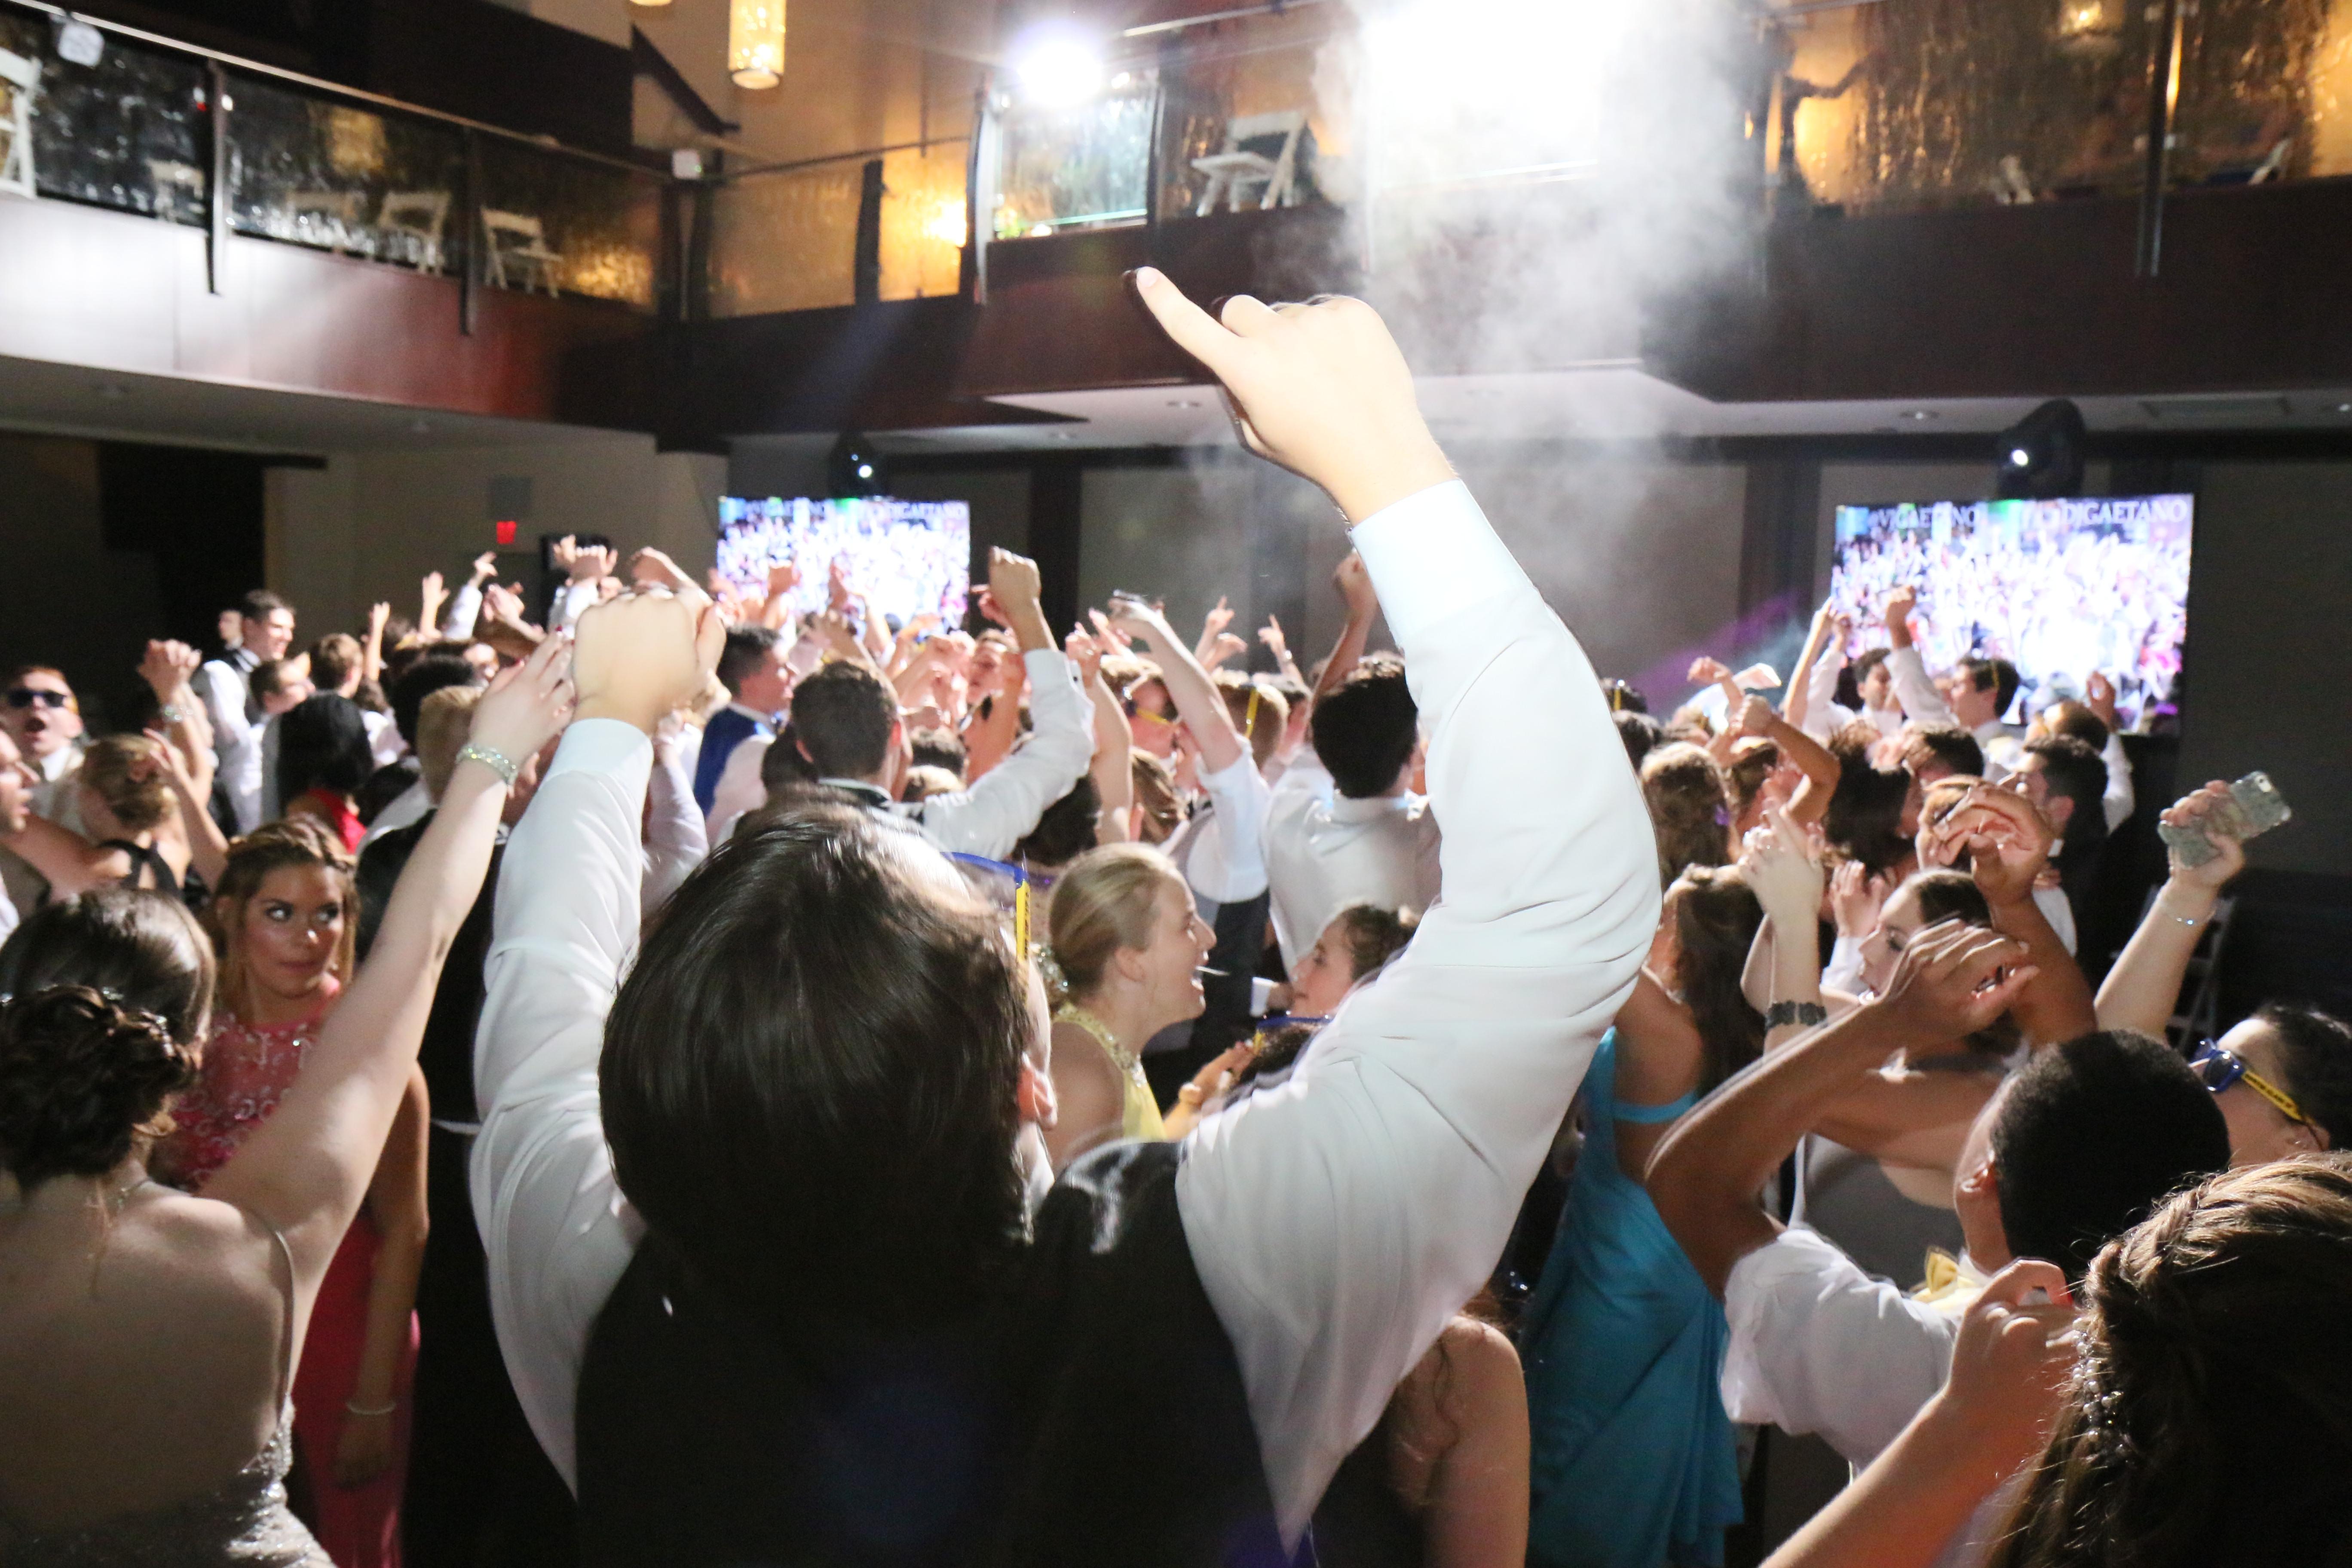 Phoenixville Foundry, Prom, DJ Gaetano Entertainment, DJ Gaetano, Lighting, Sound, Multi-media production